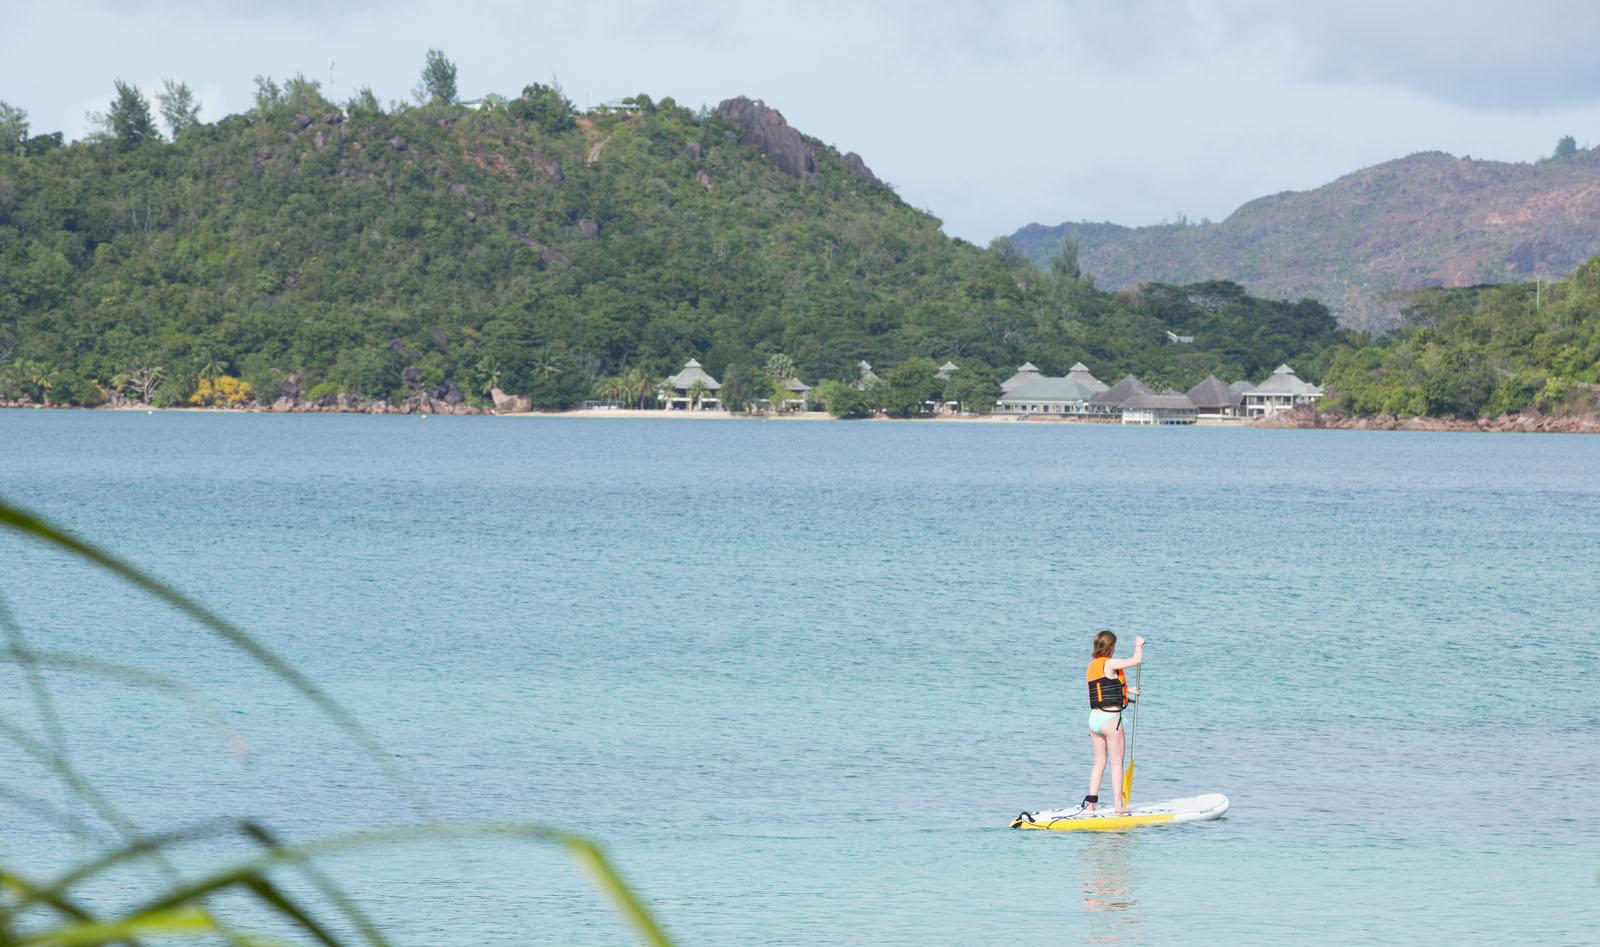 enjoying a paddle-boarding lesson